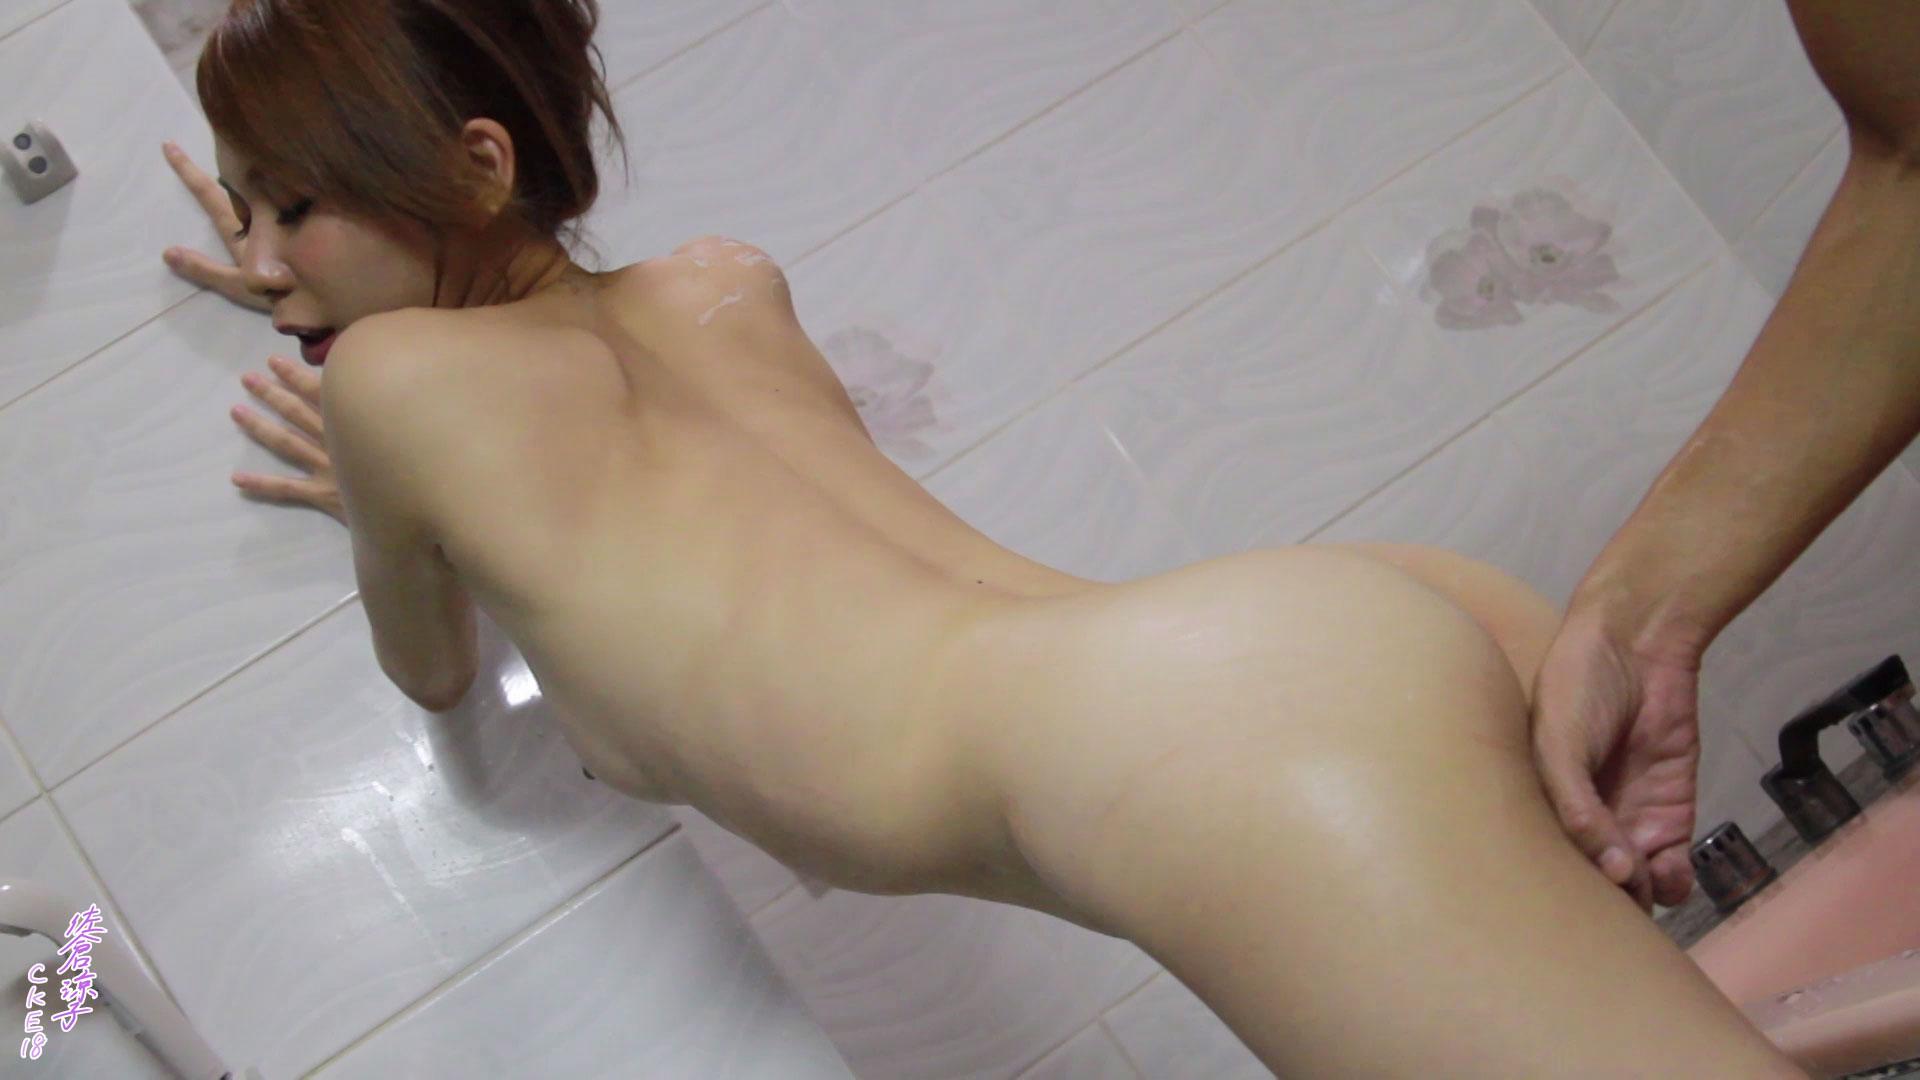 Nude sexy women upclose